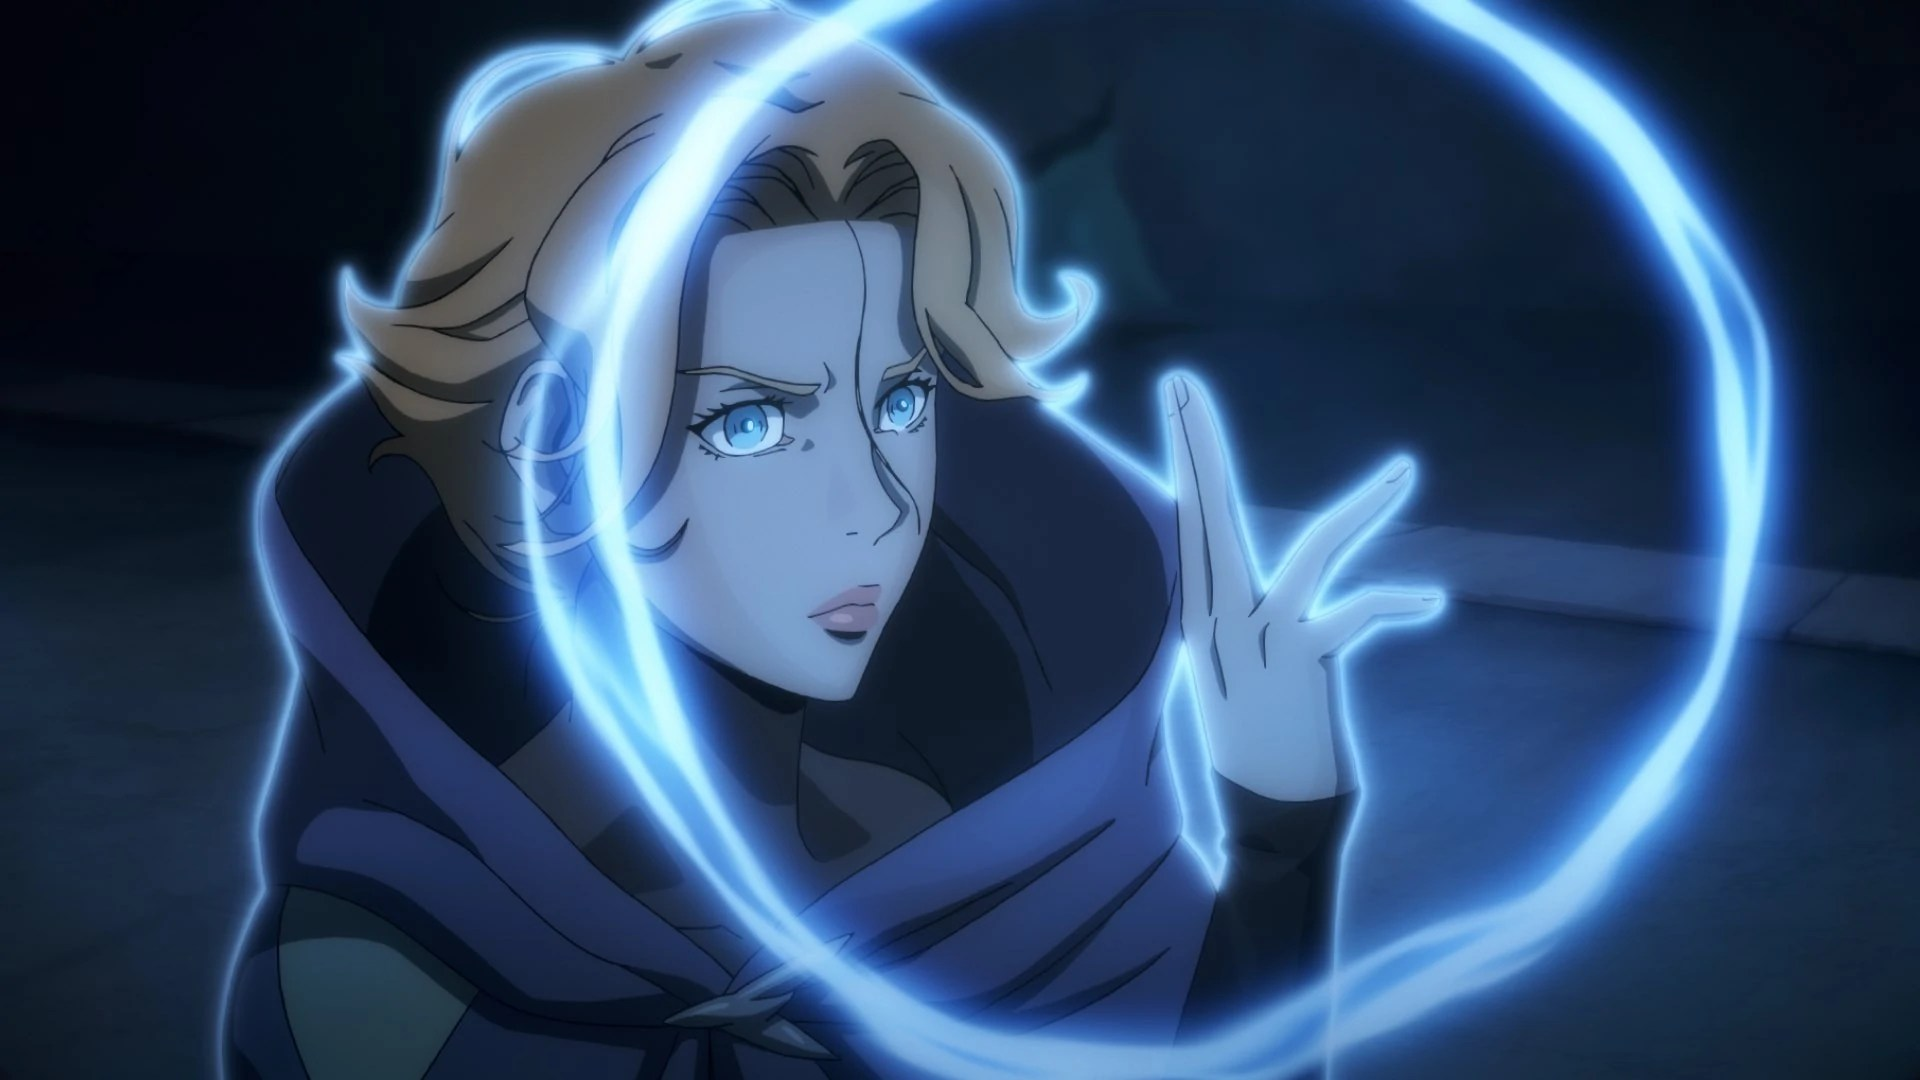 Magi Anime Wallpaper Sypha Belnades Netflix Series Castlevania Wiki Fandom